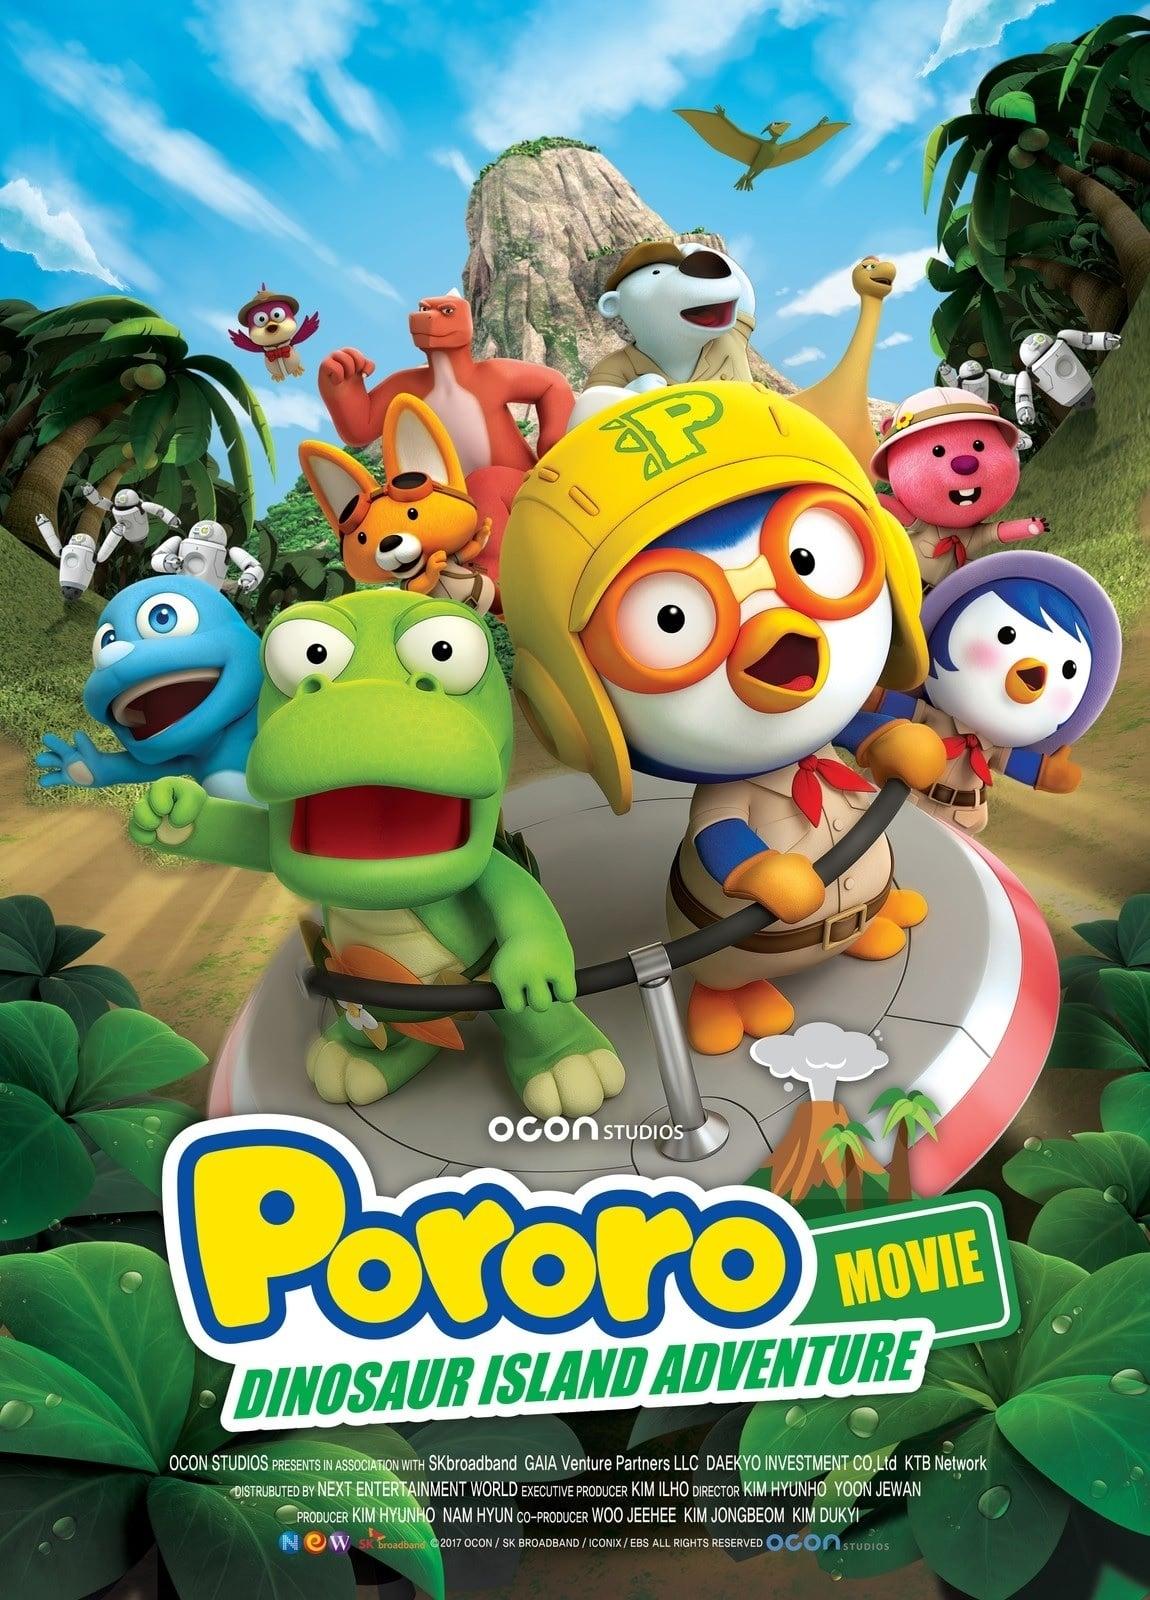 Pororo, Dinosaur Island Adventure